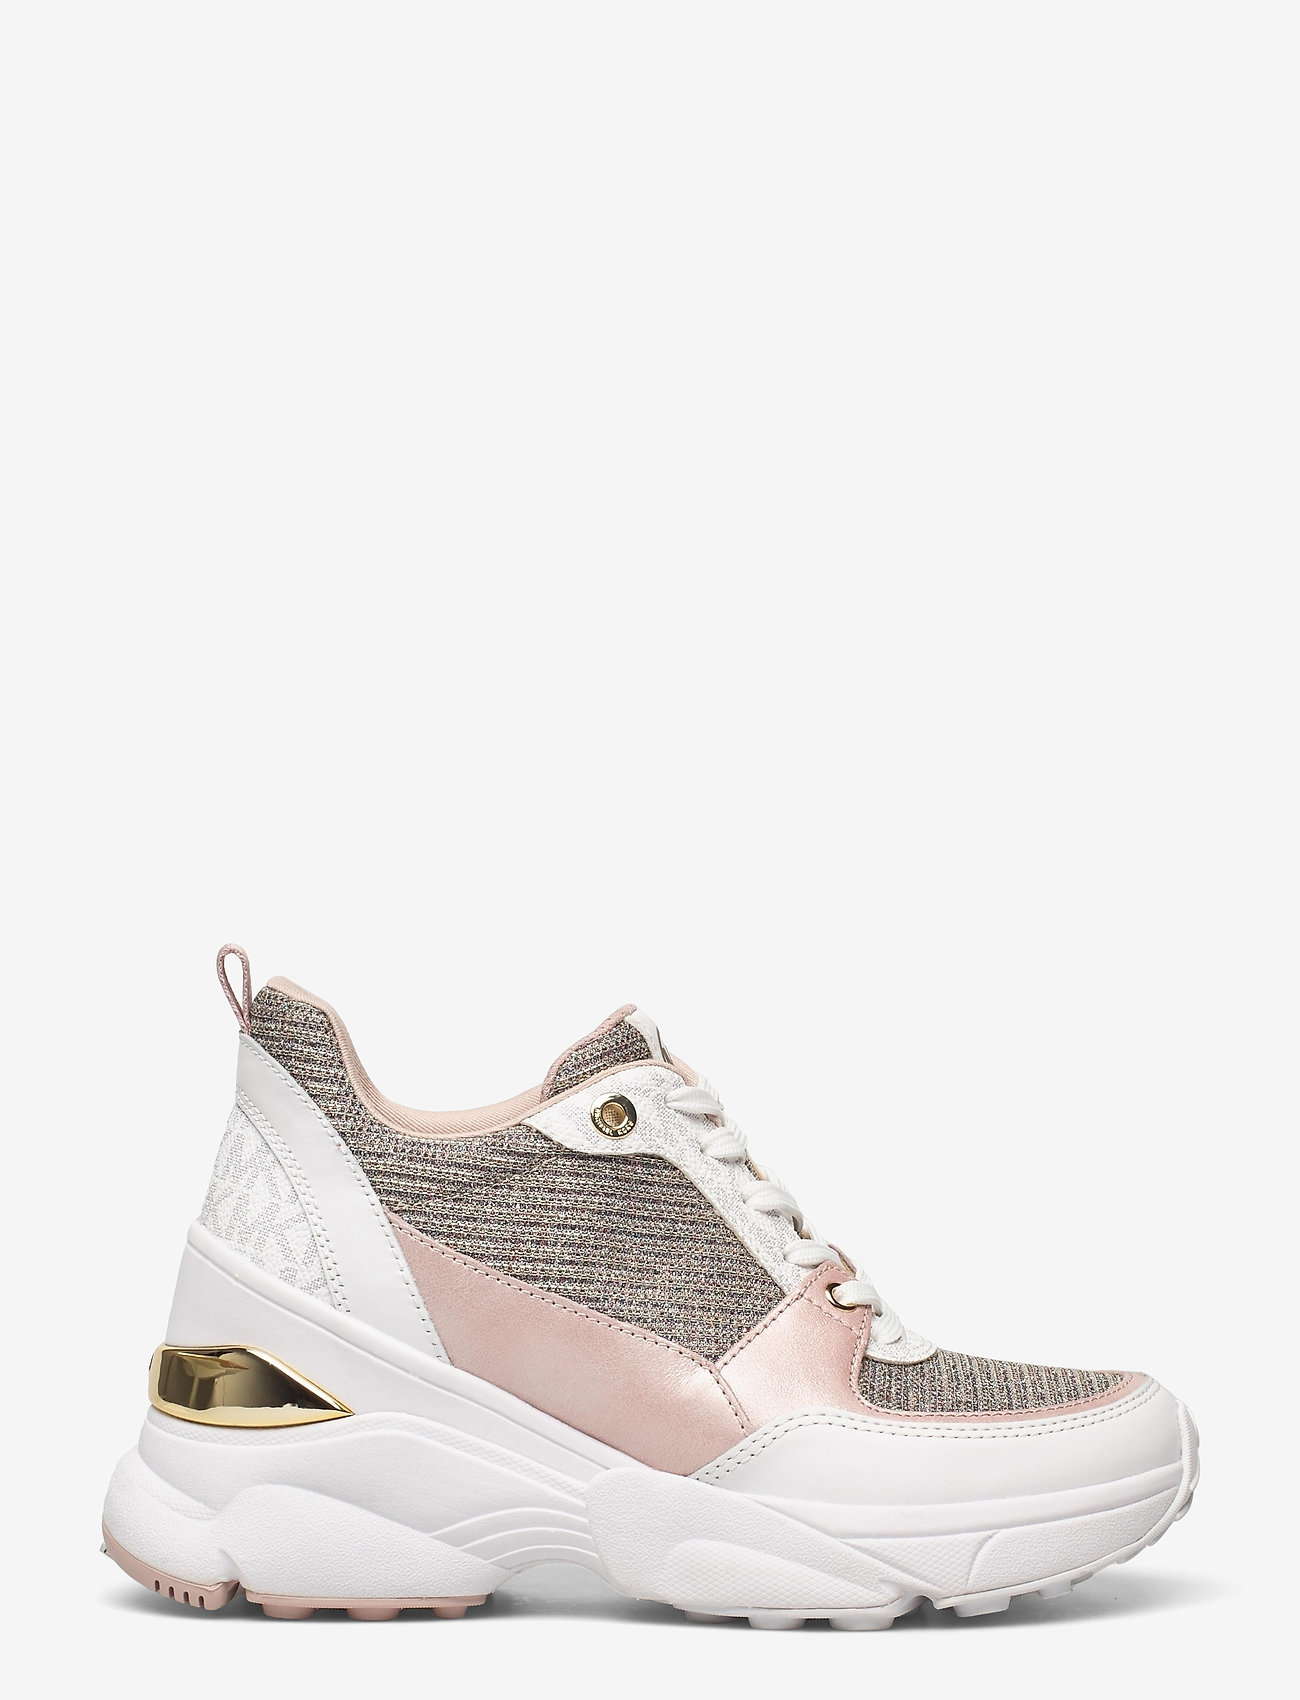 Michael Kors - MICKEY TRAINER - chunky sneakers - wht rainbow - 1